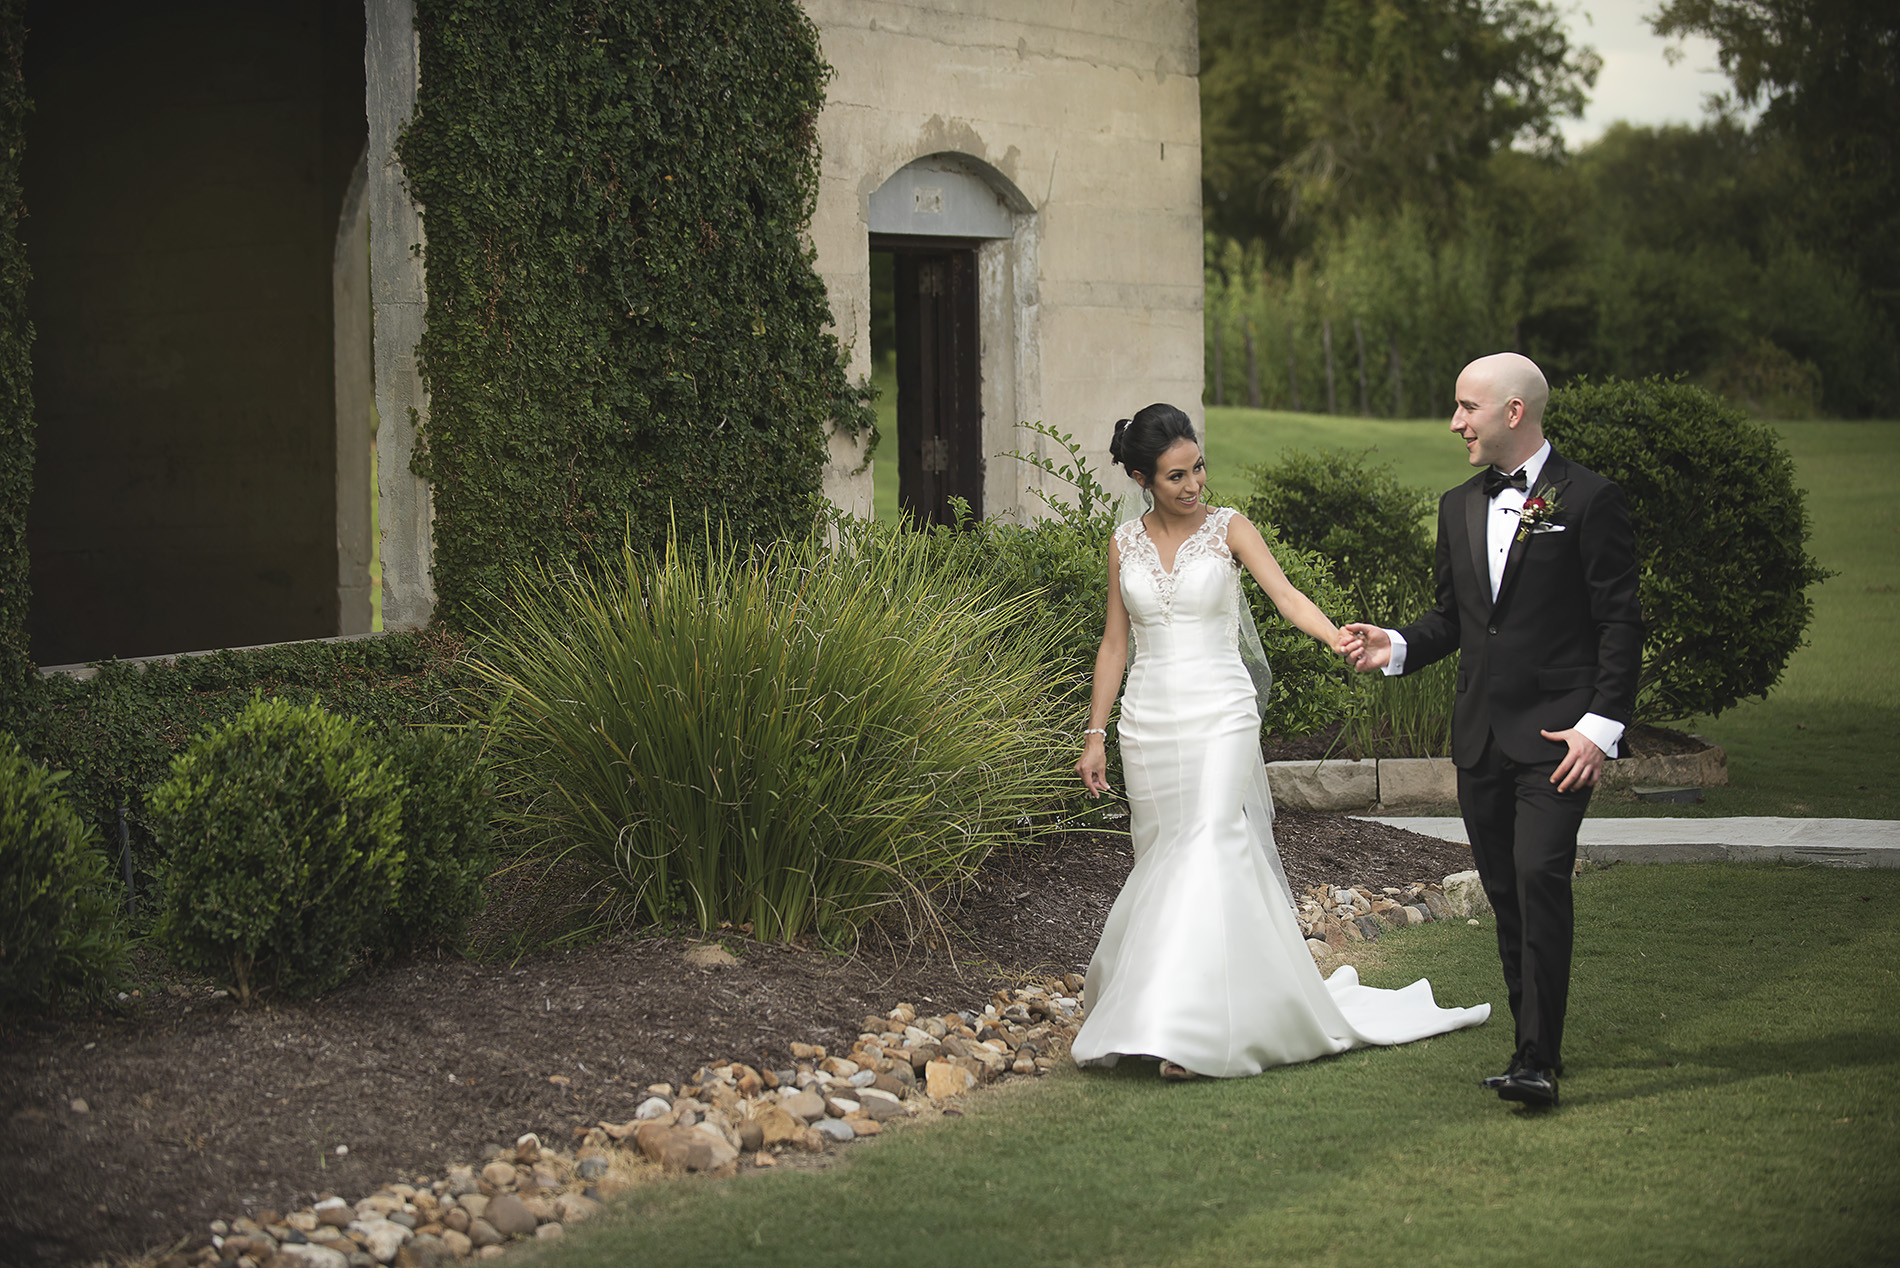 Houston-venue-Olde-Dobbin-Station-Romantic-Classic-Wedding-Photographer-030.jpg